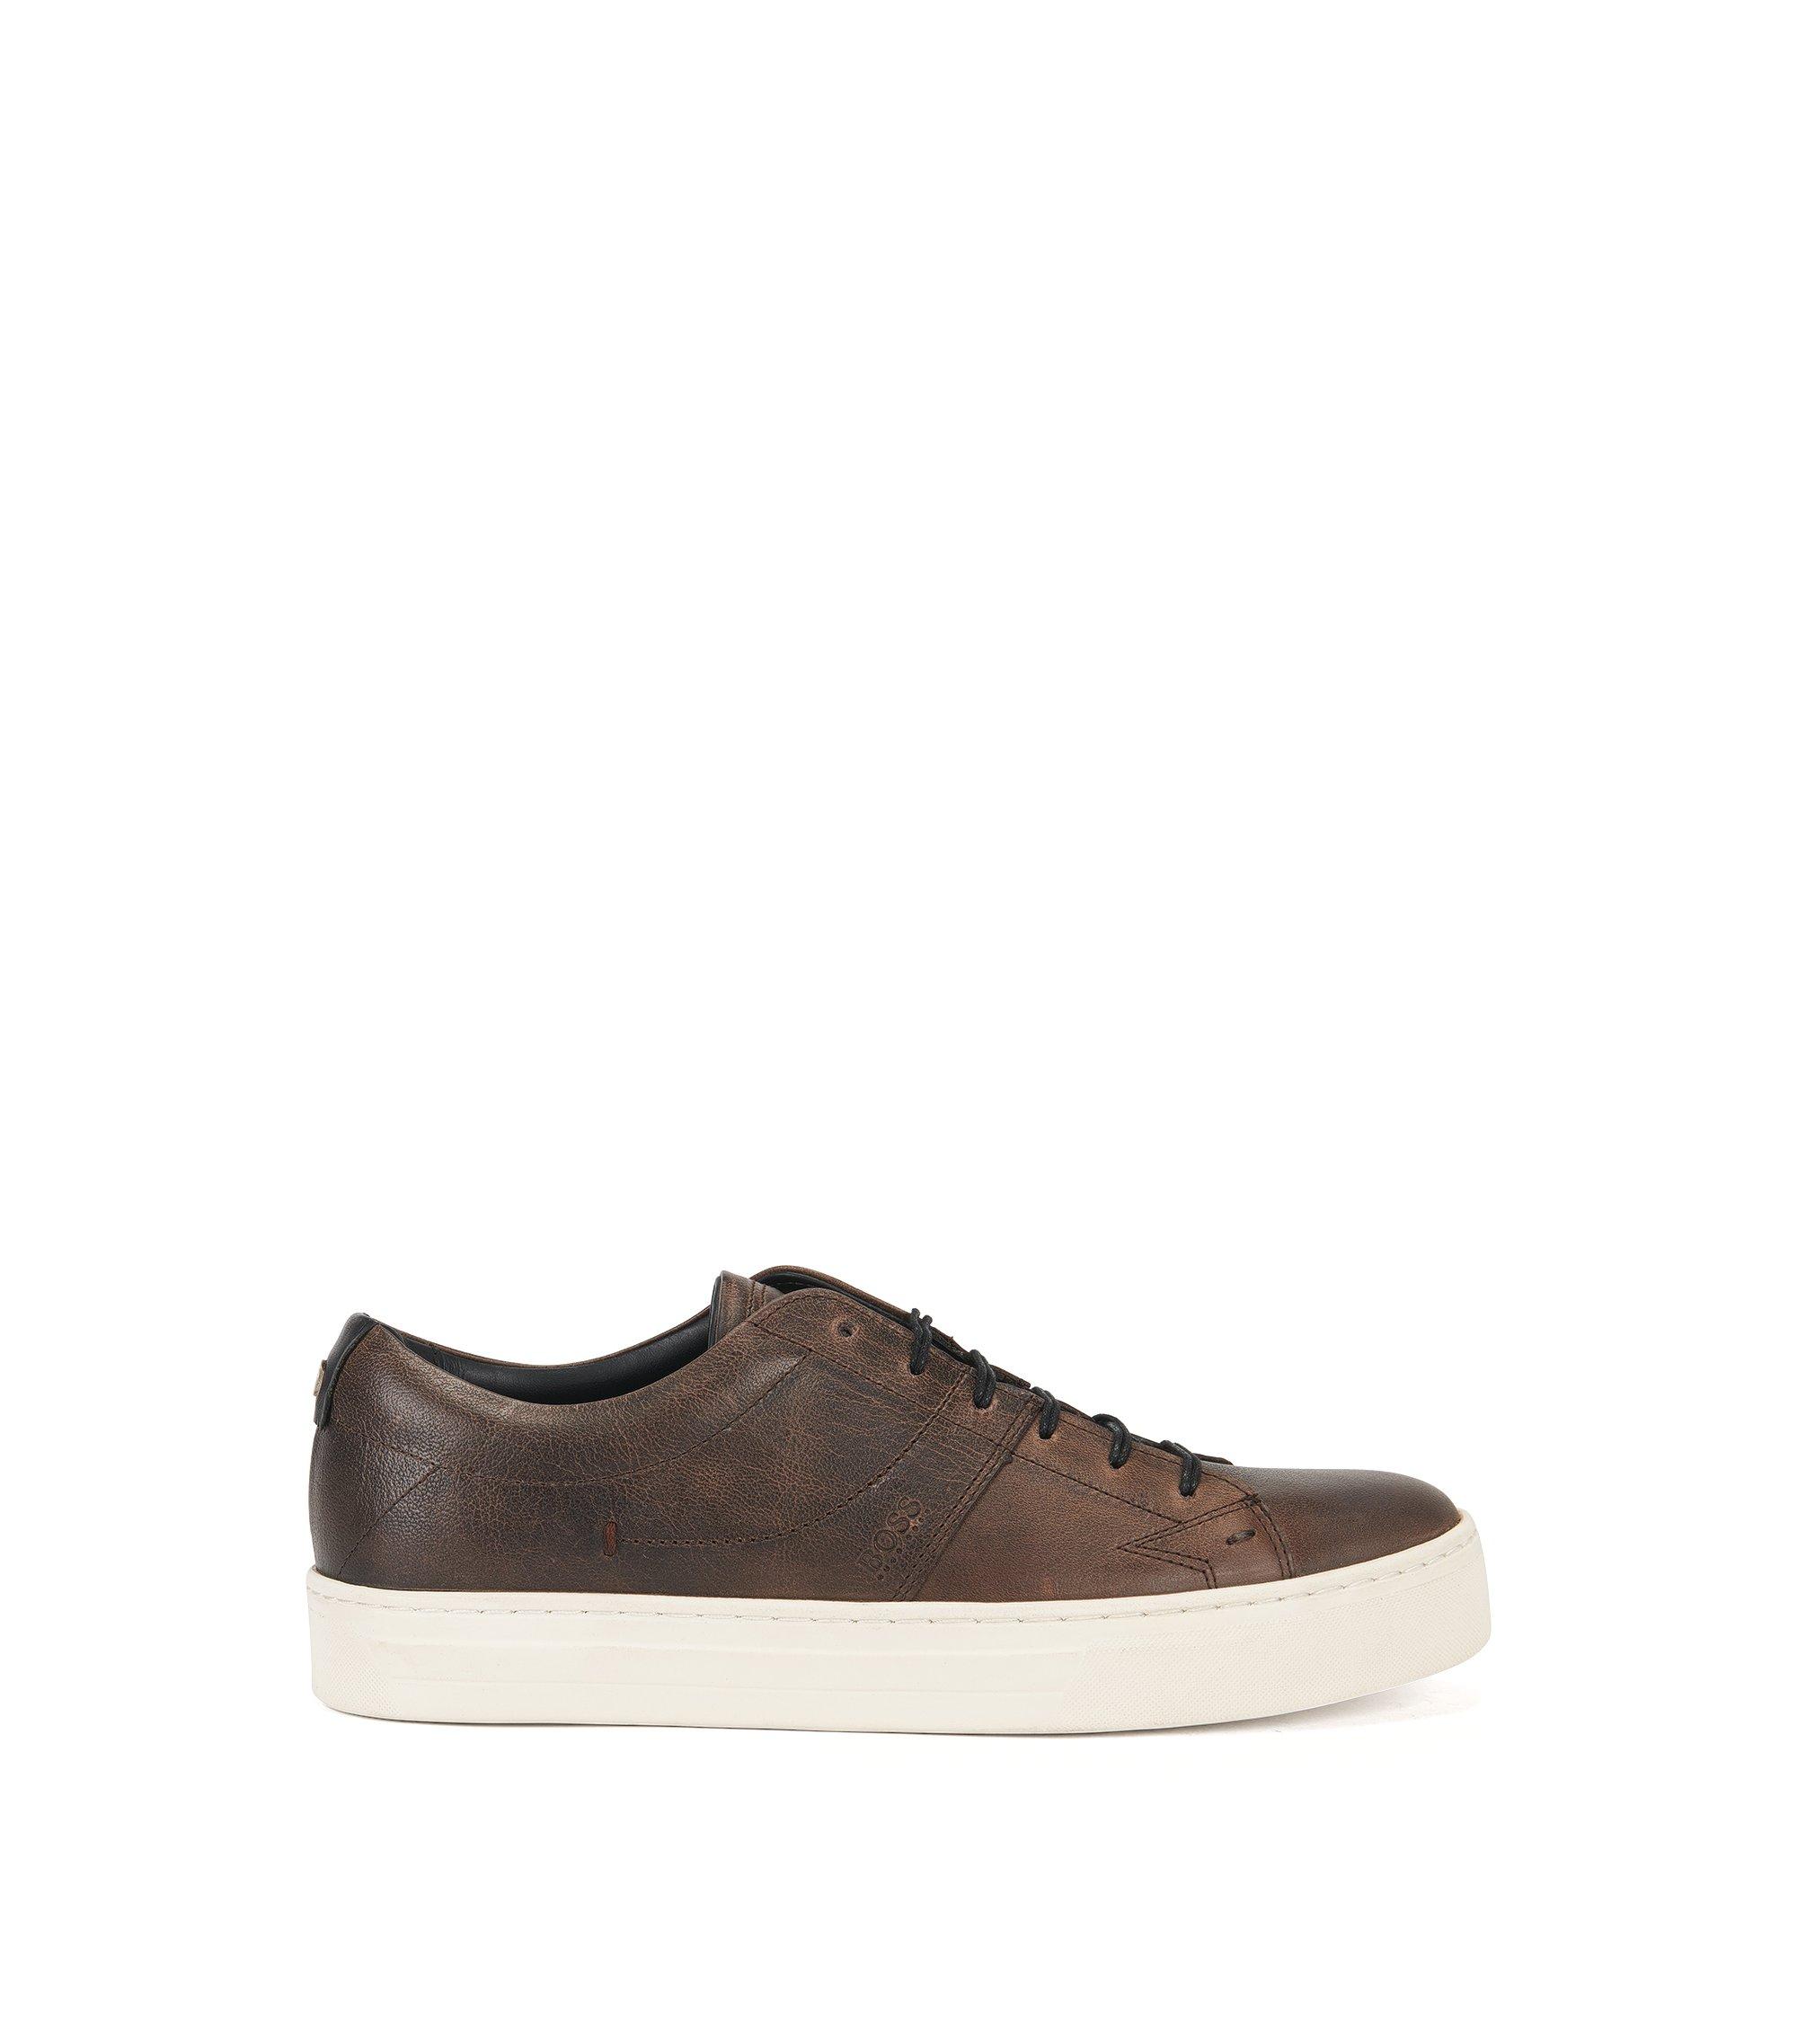 Leather Tennis Shoe | Noir Tenn Pp, Brown